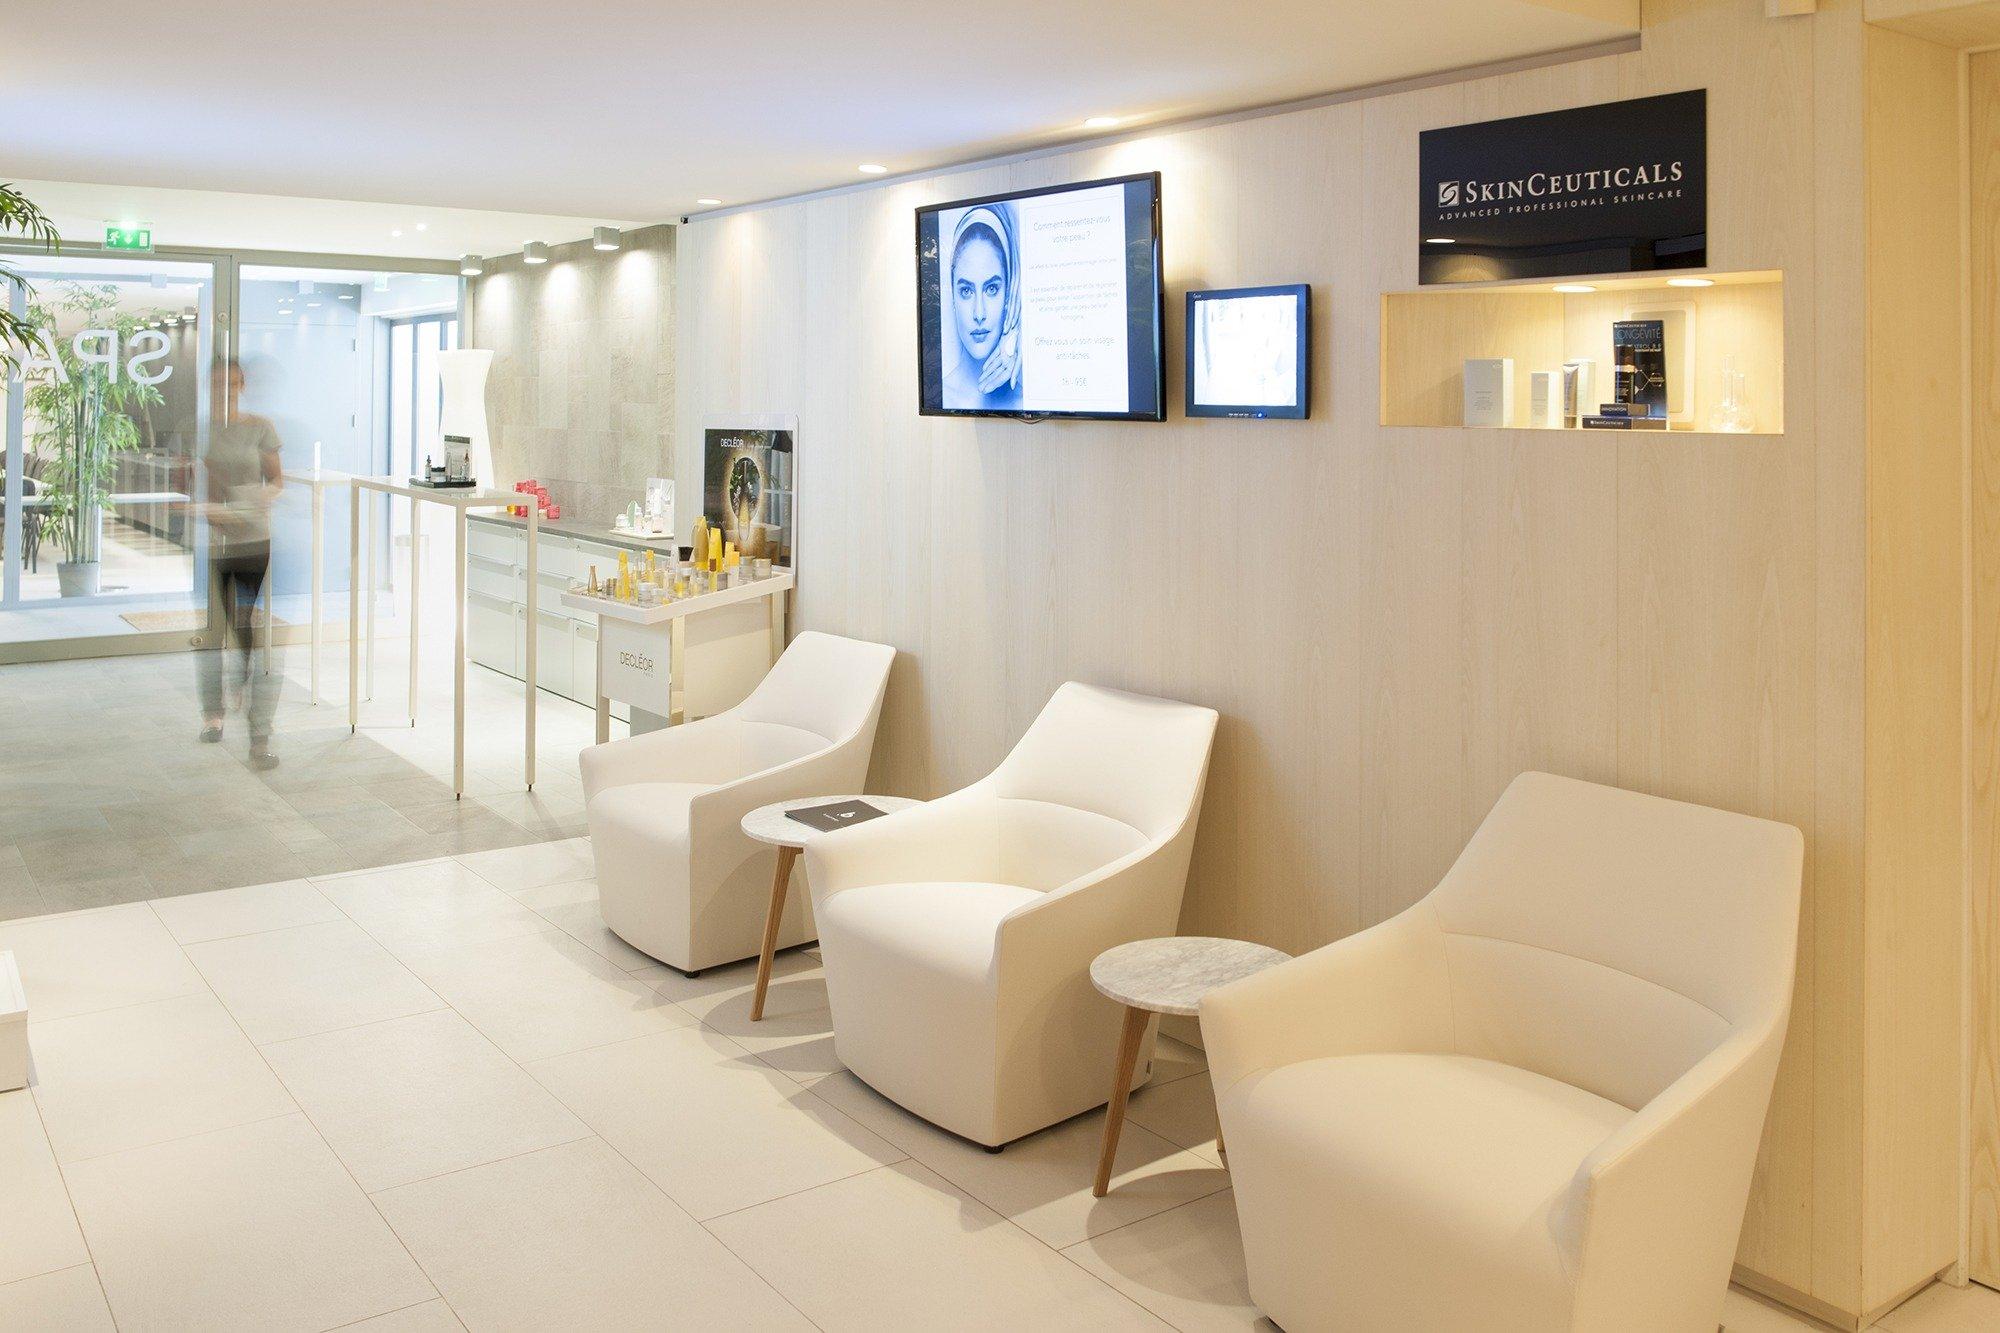 H tel b design spa h tel spa 5 toiles paradou provence for Hotel design provence